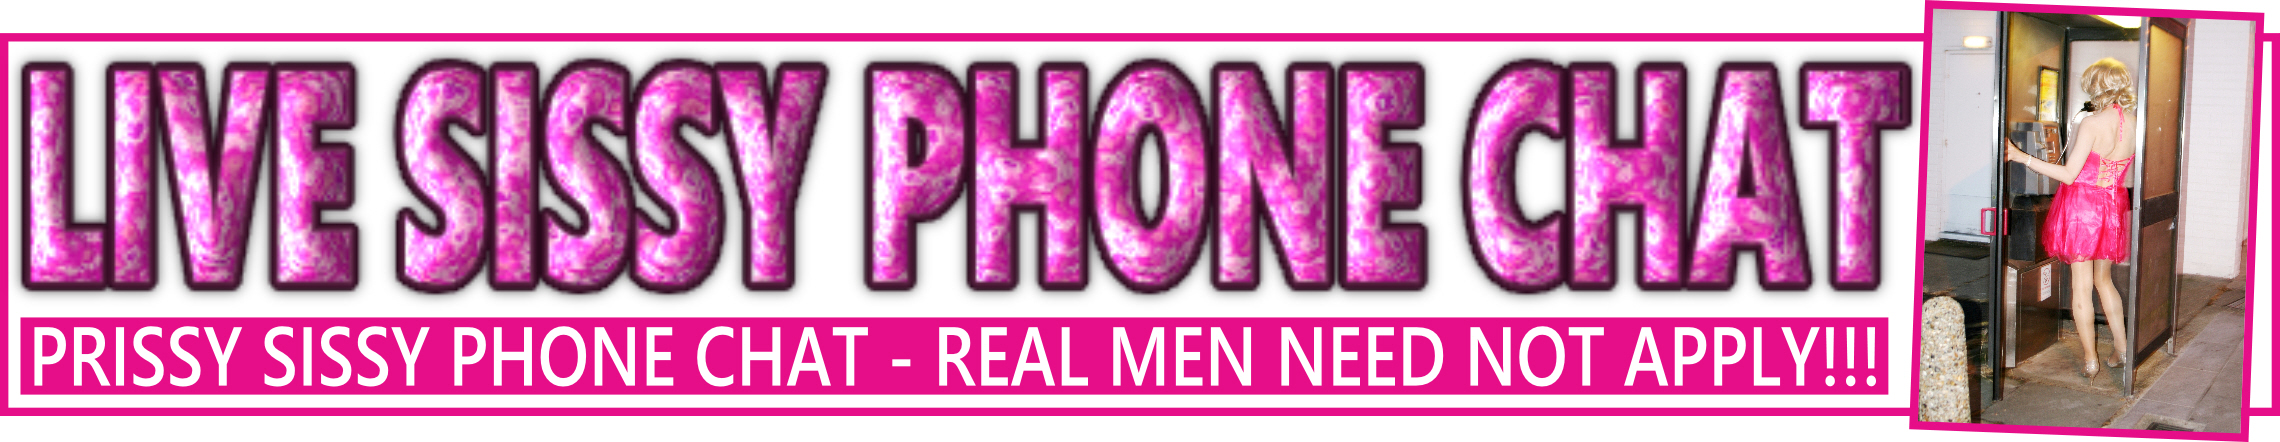 Live sissy transvestite phone domination chatline